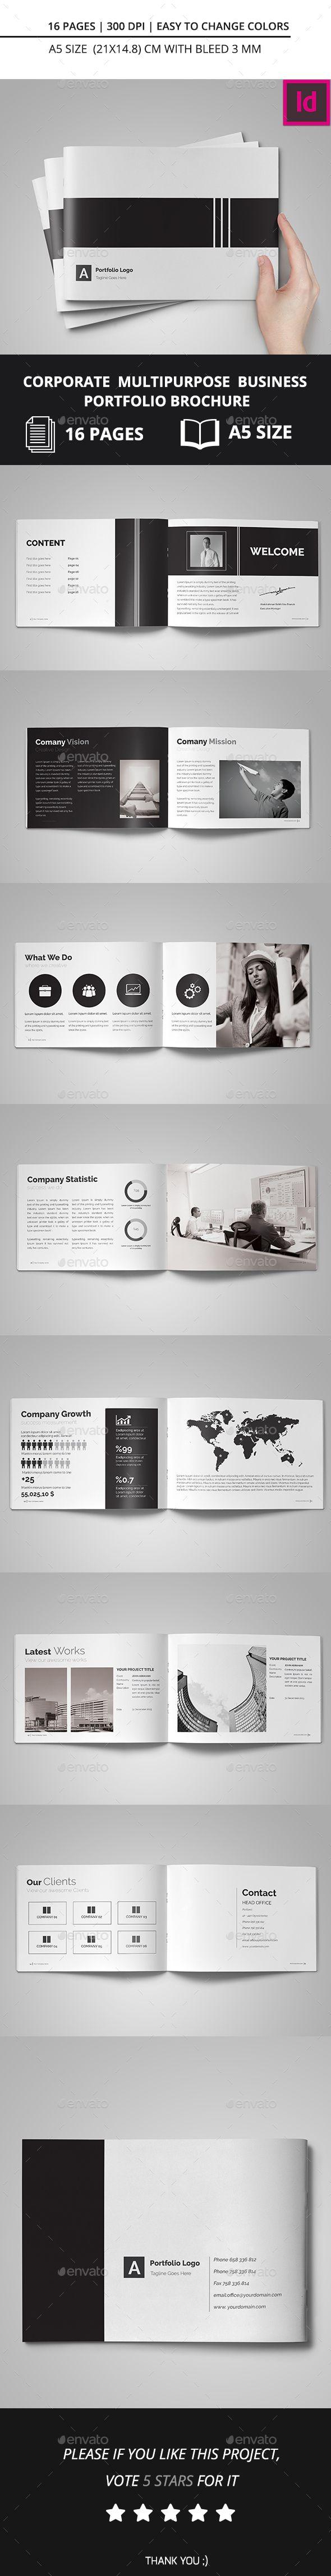 Corporate Multipurpose Business Portfolio Brochure Template InDesign INDD…